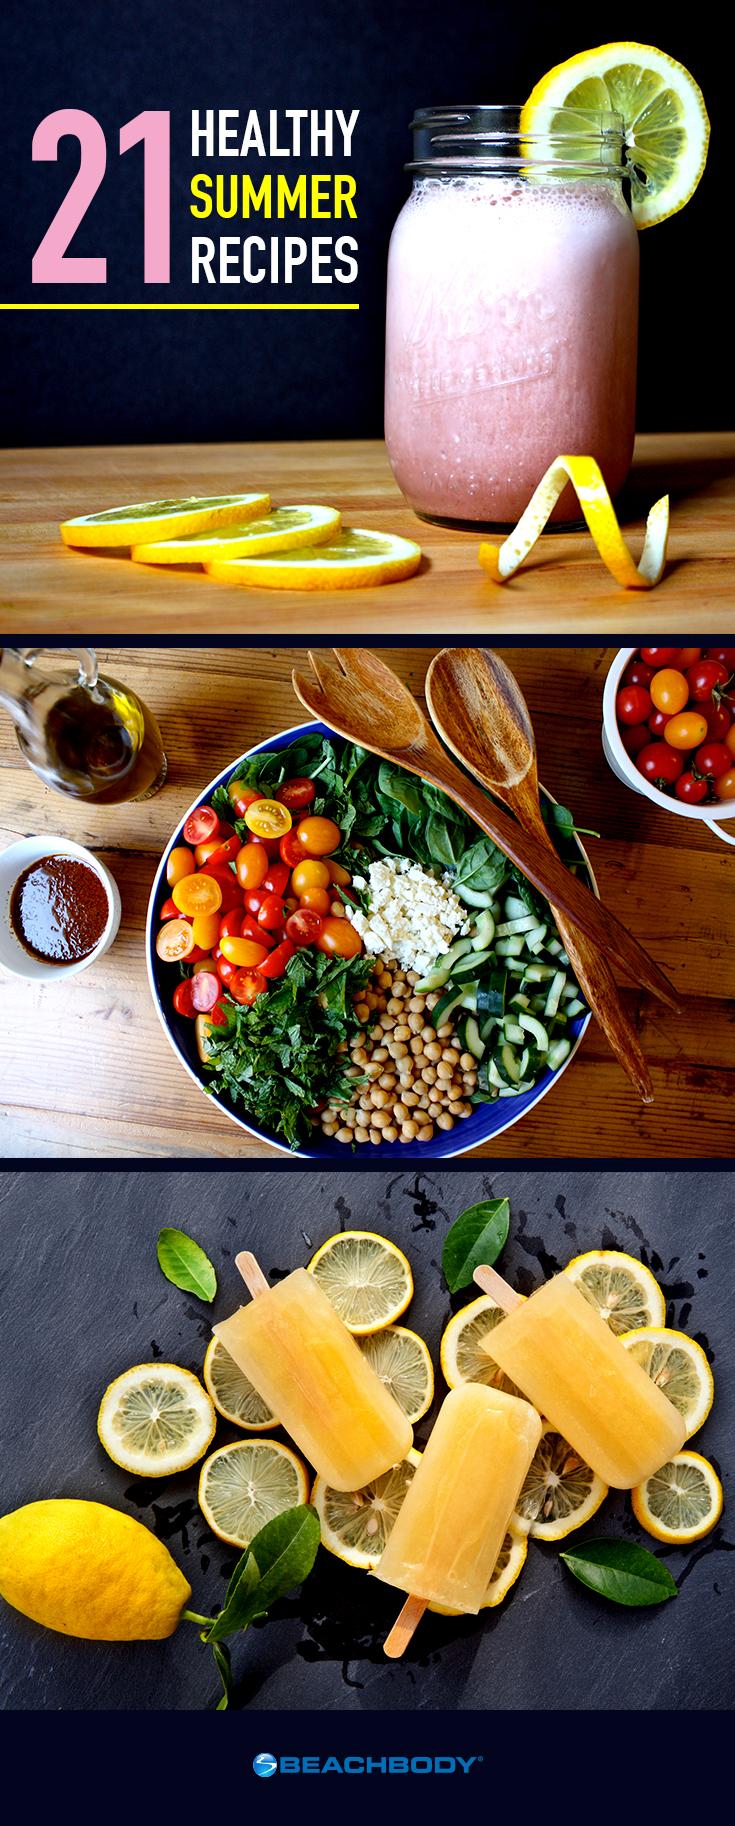 21 Healthy Summer Recipes